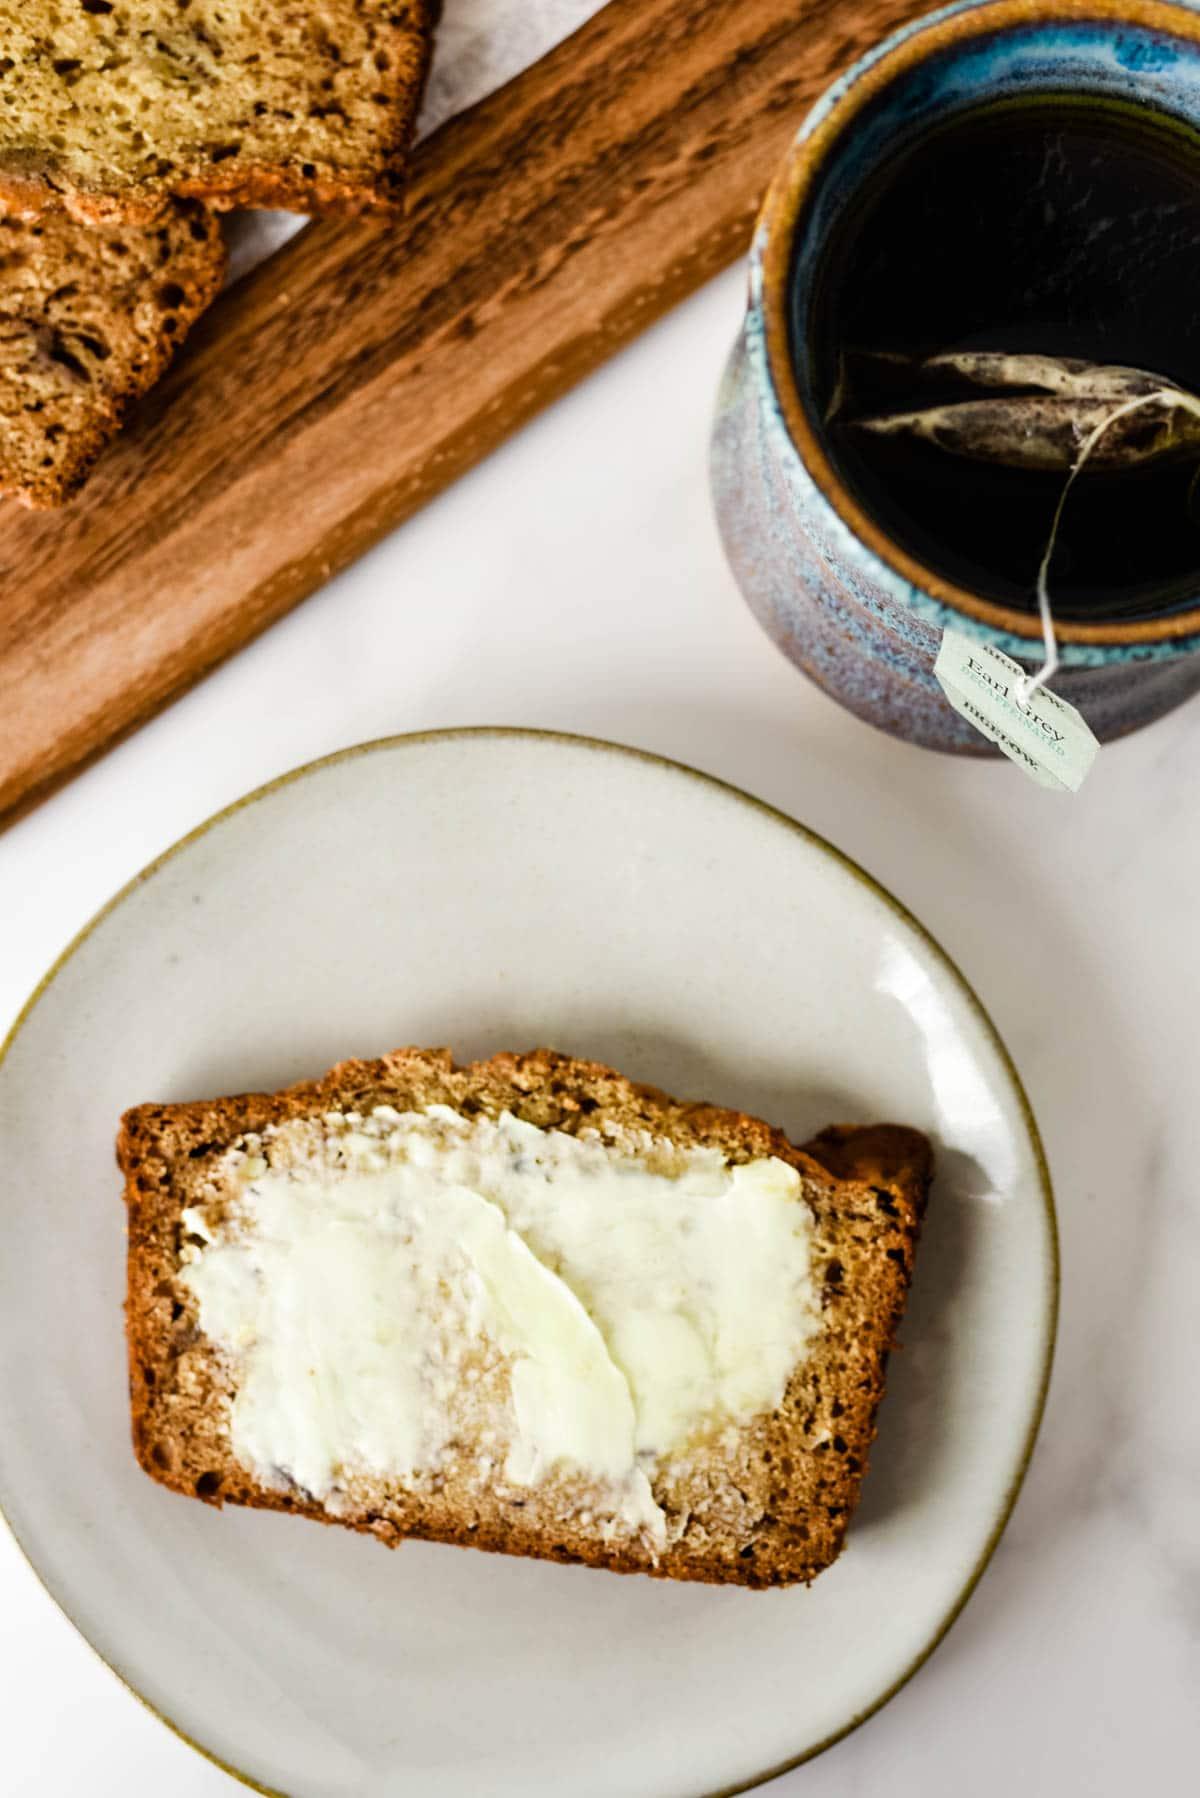 slice of earl grey banana on plate with butter and tea mug beside